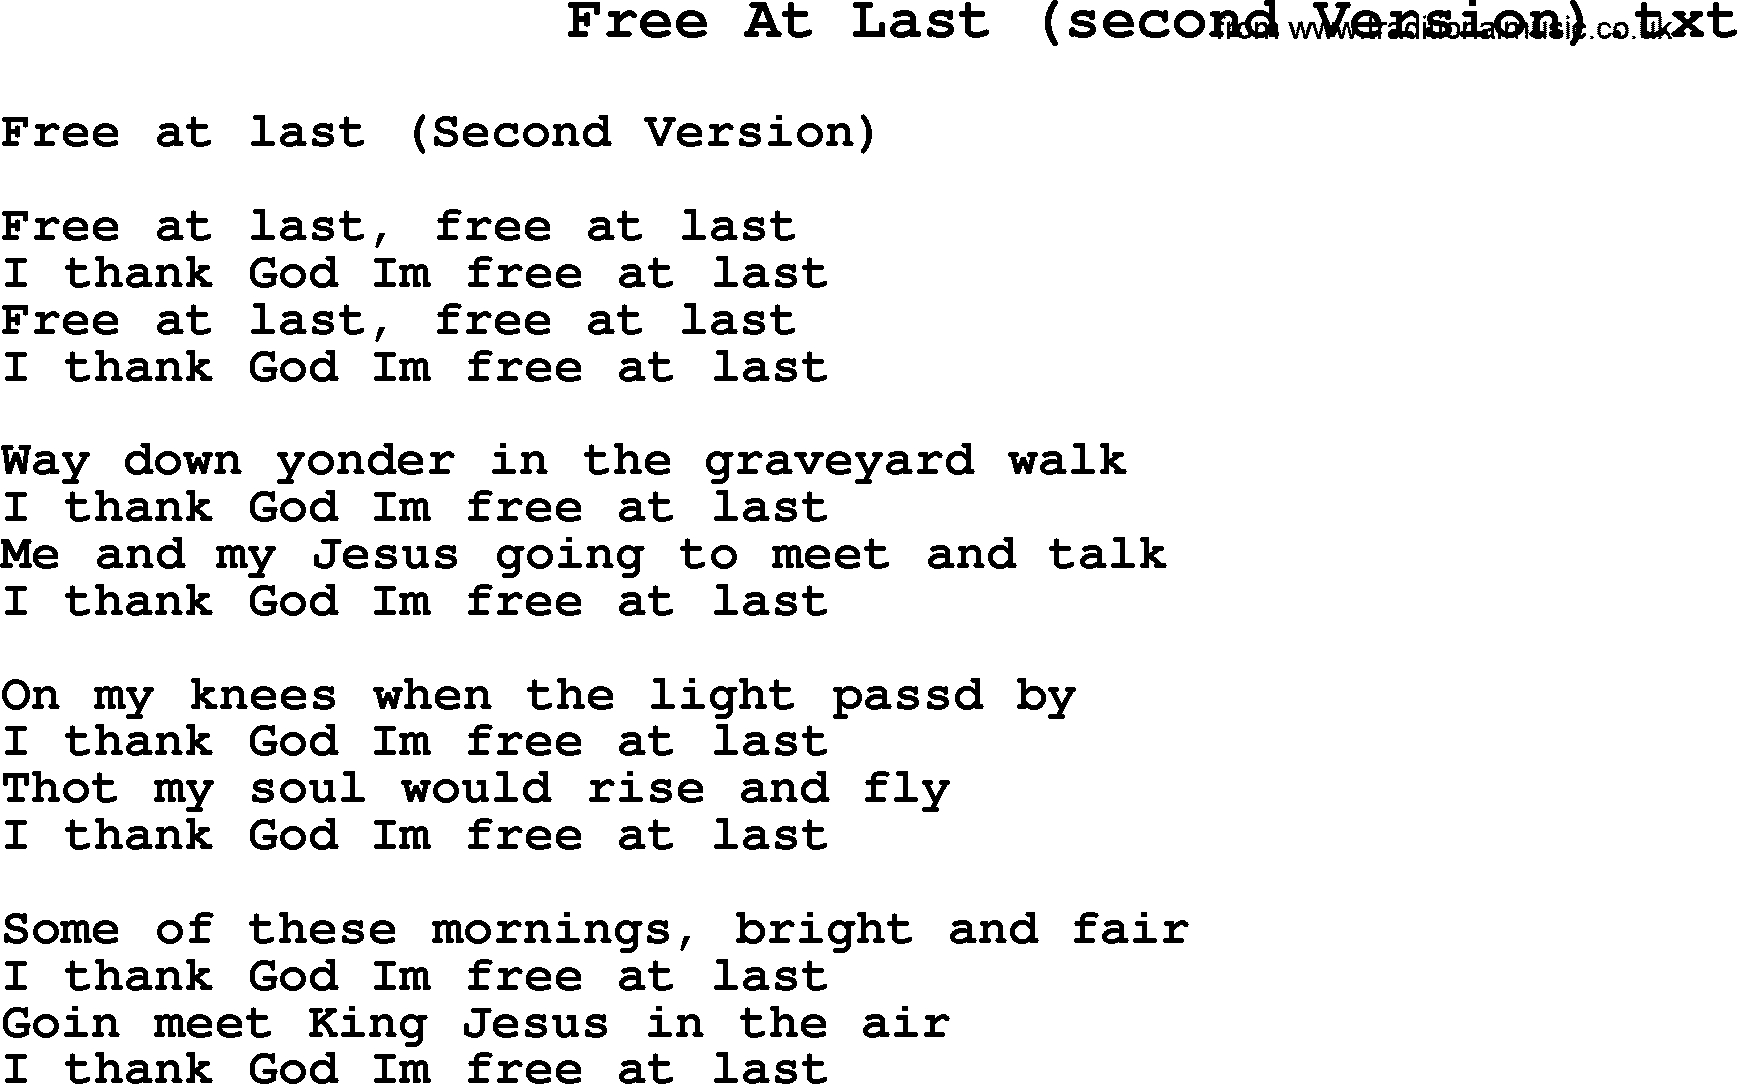 Negro Spiritual/slave Song Lyrics For Free At Last(2) - Free Printable Song Lyrics